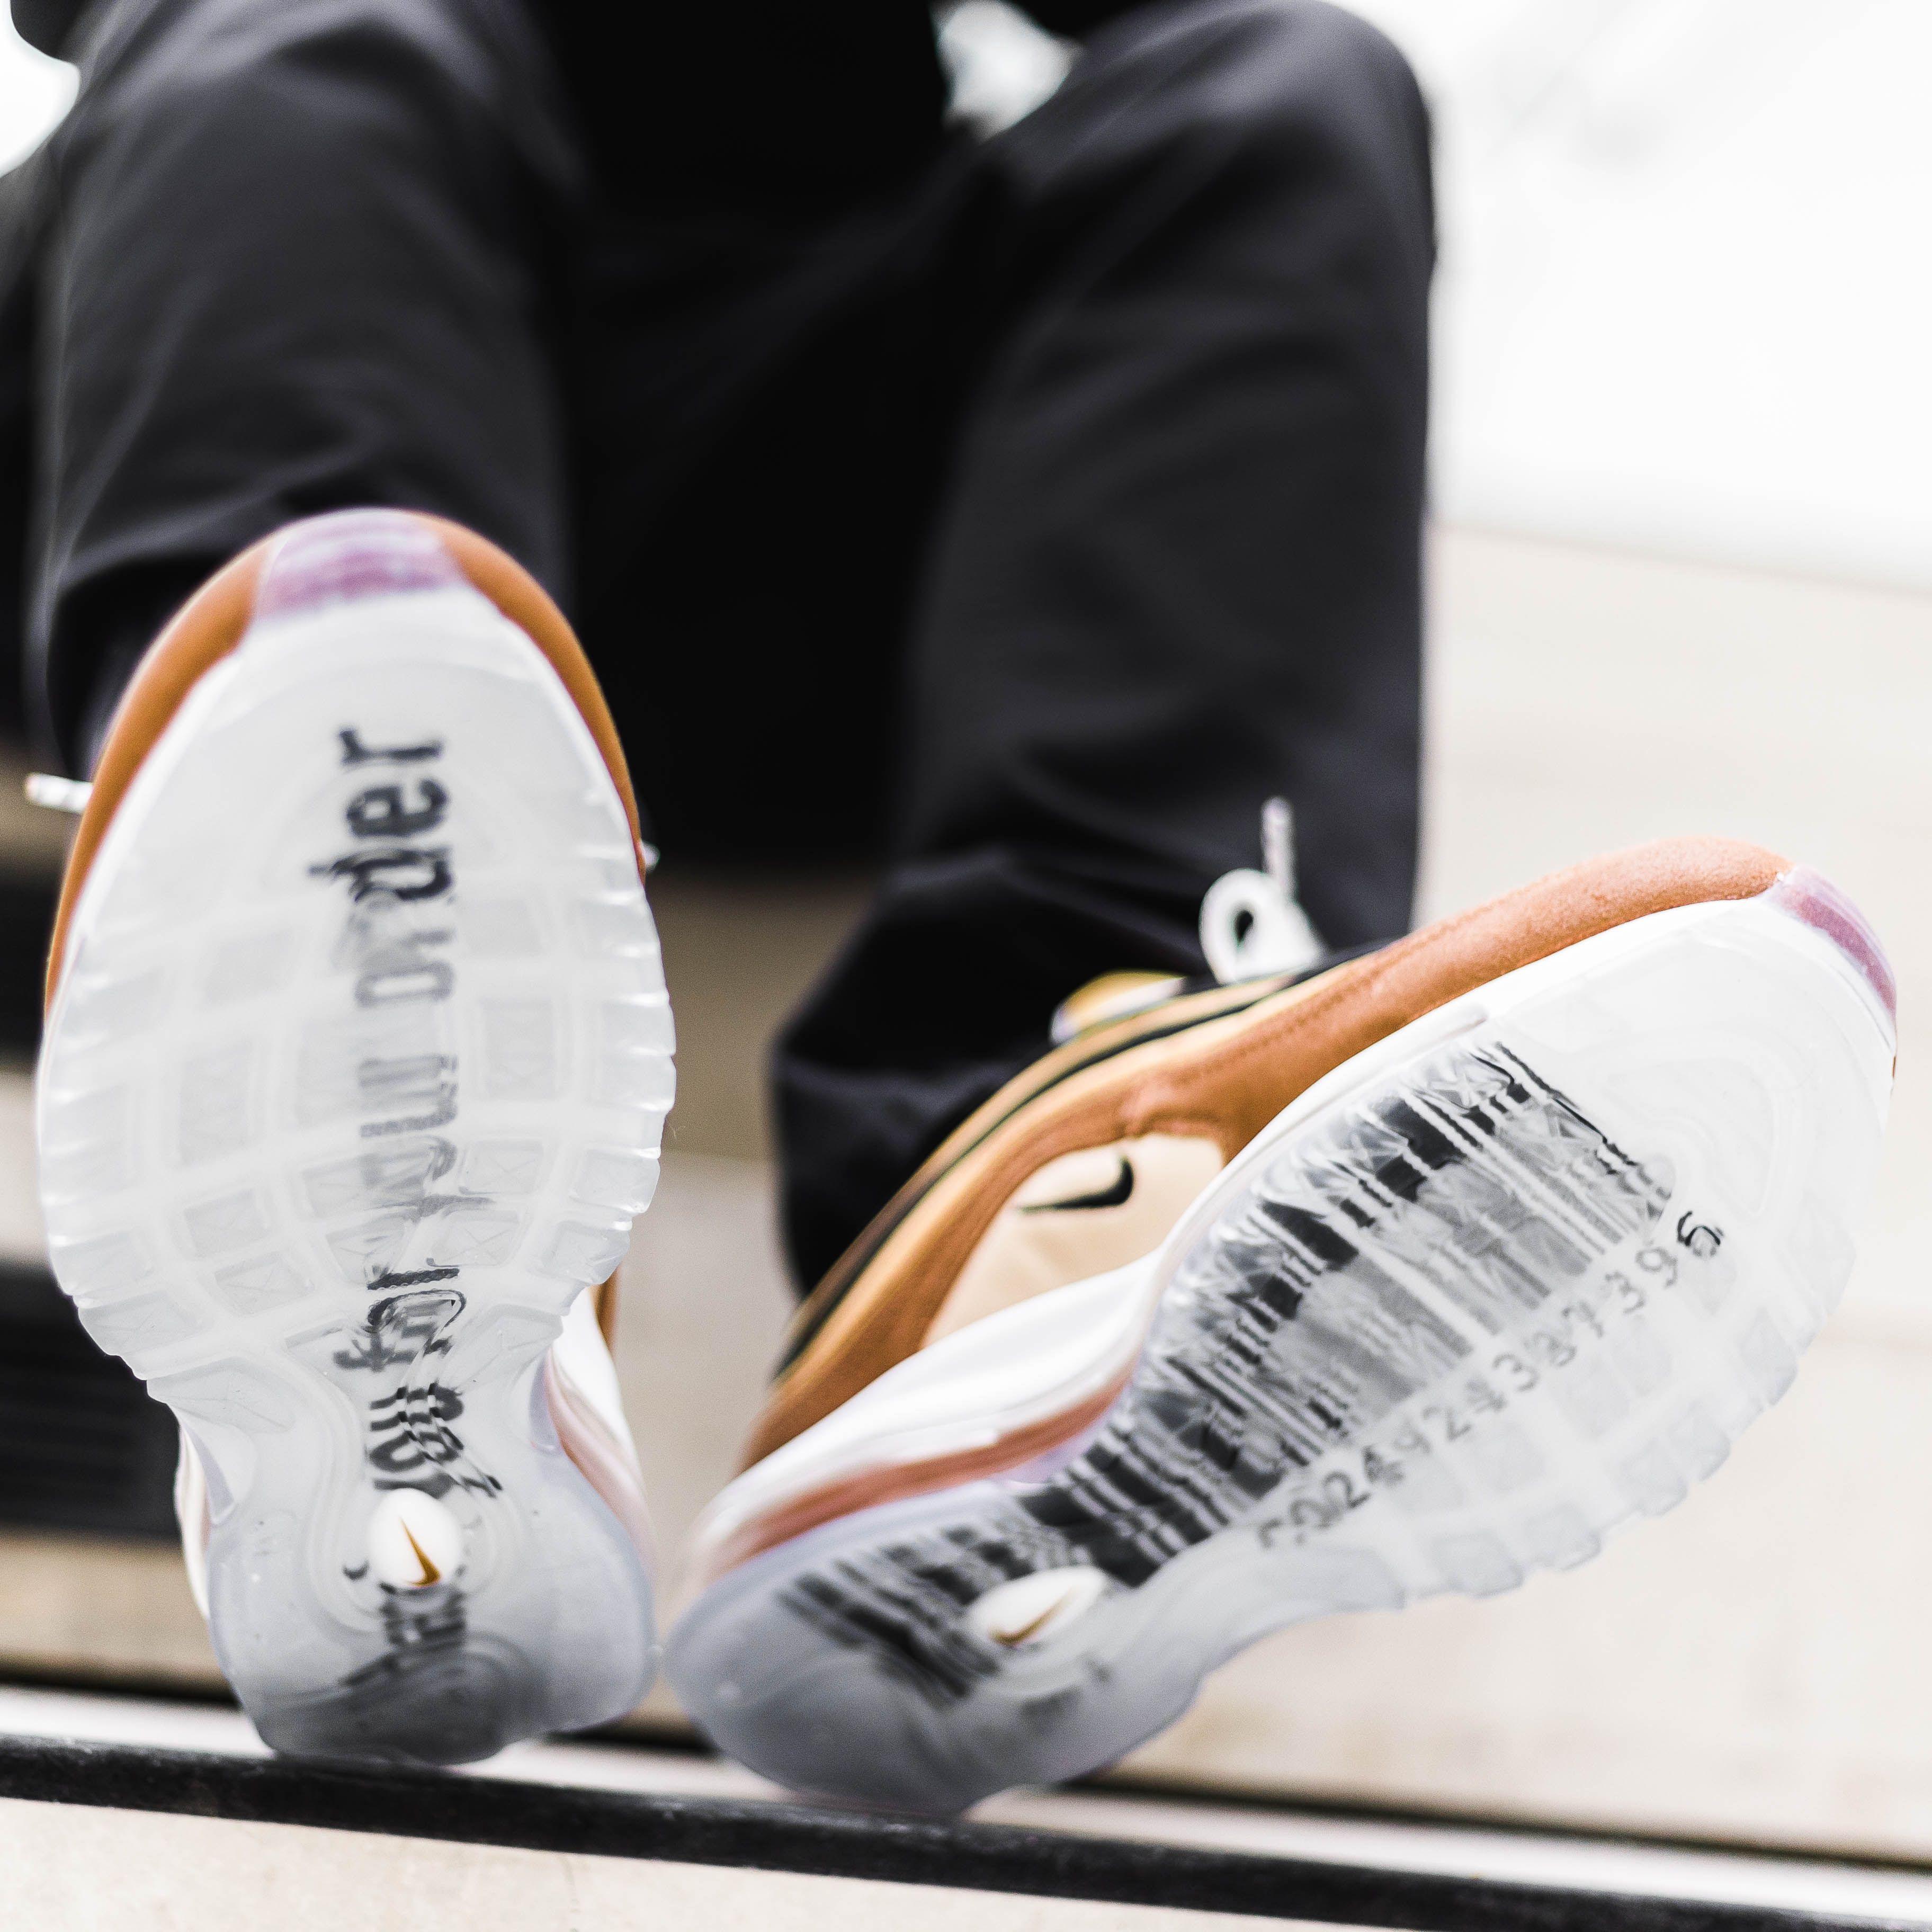 Nike AIR MAX 97 QS Herren CI5011 400 Preise vergleichen